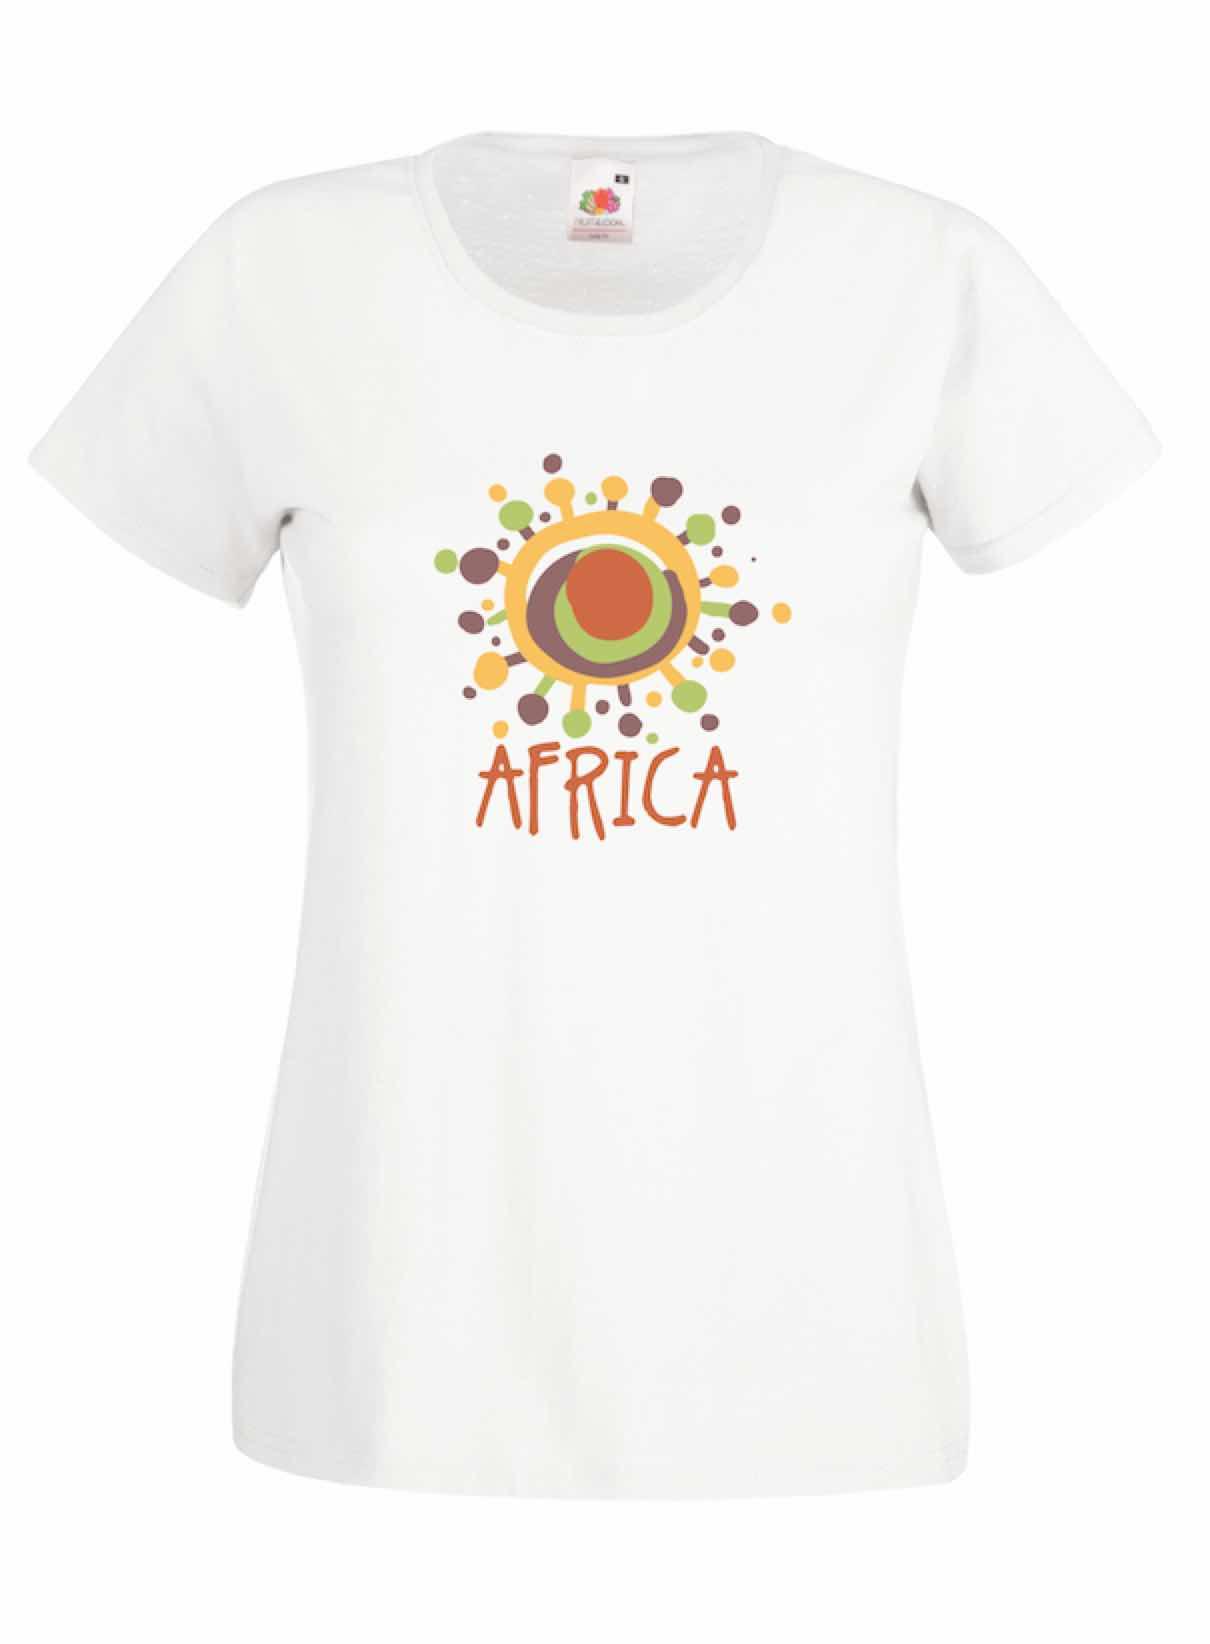 Sun design for t-shirt, hoodie & sweatshirt